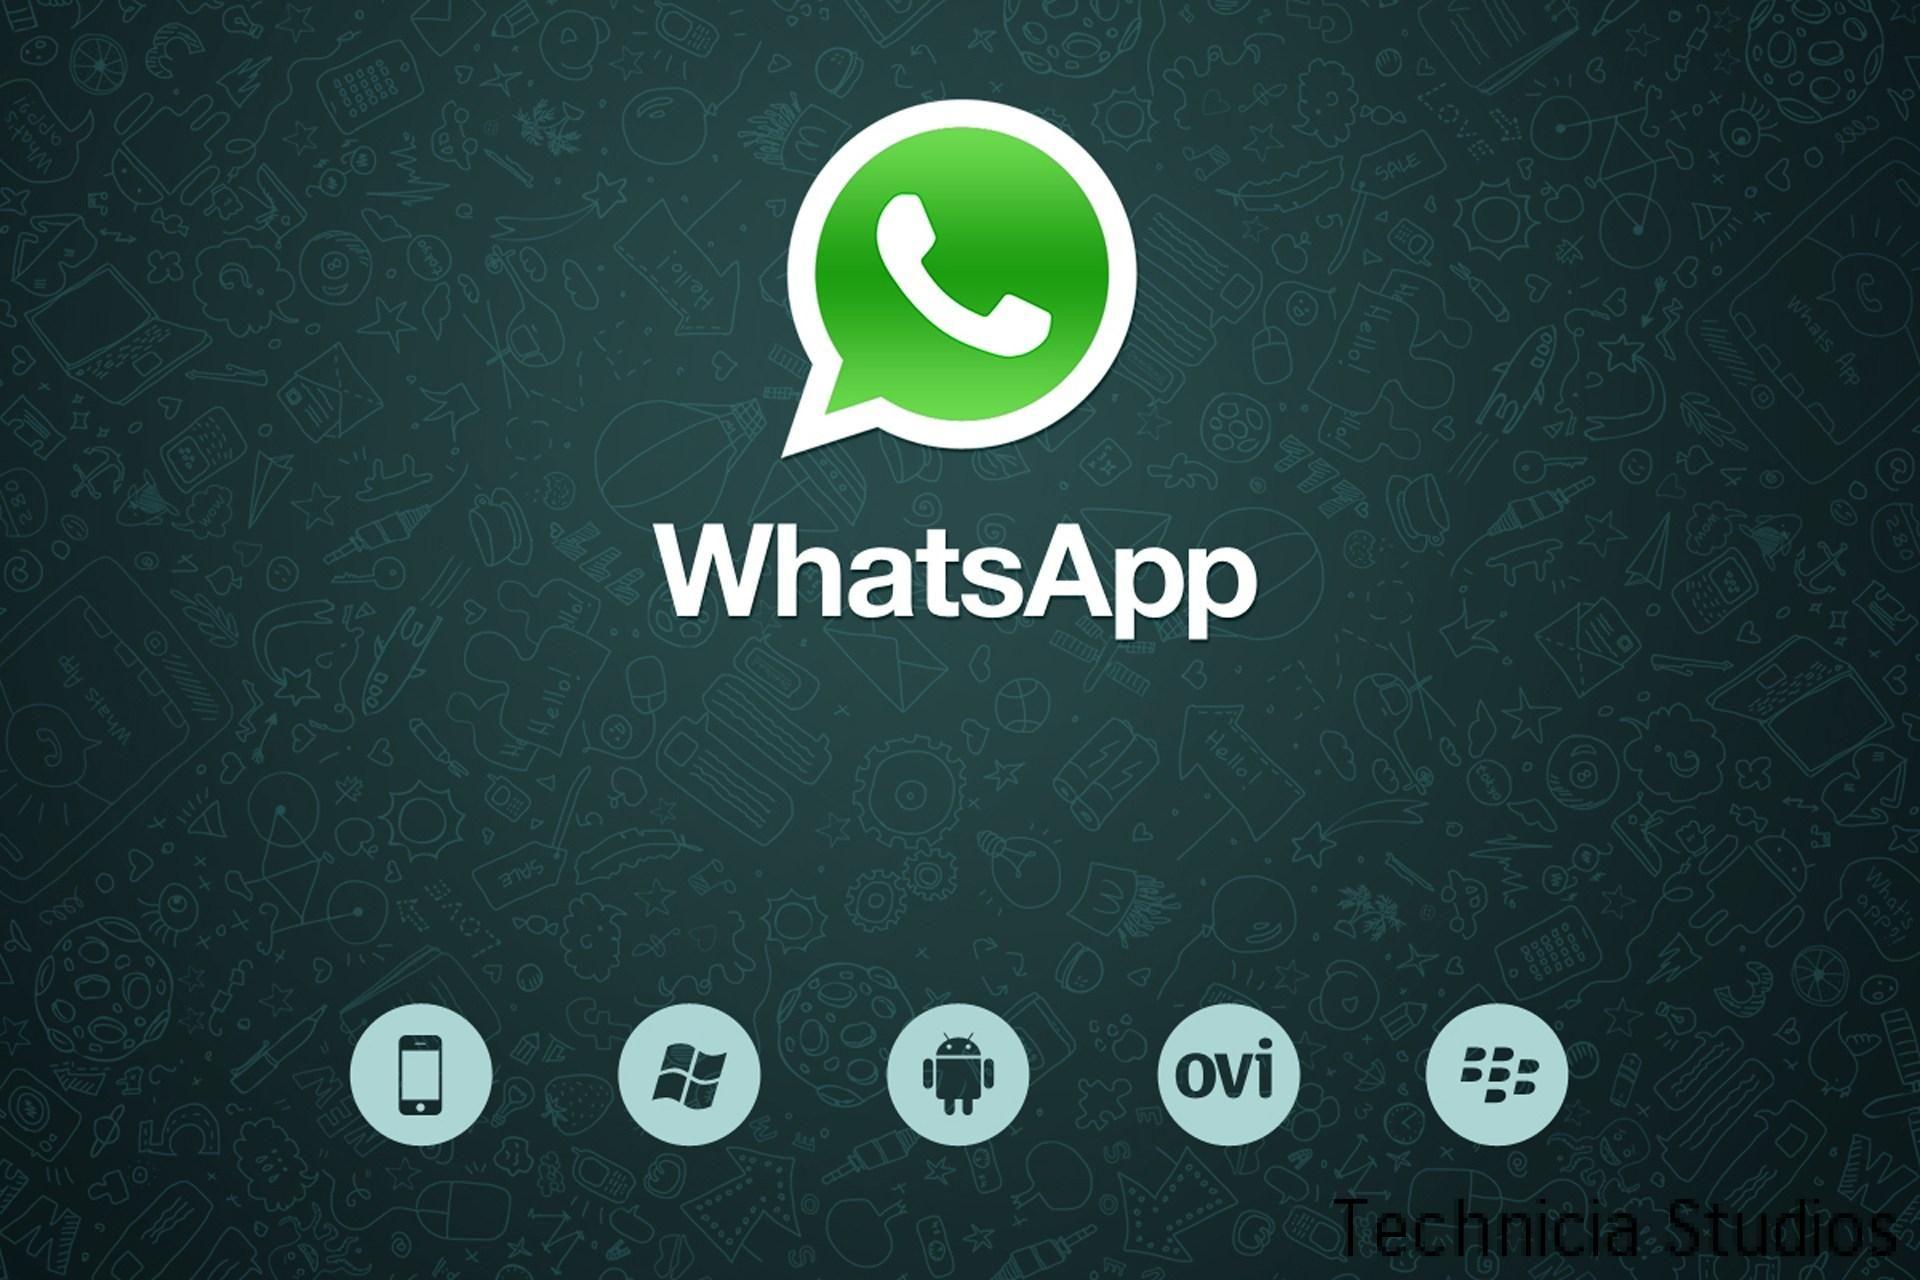 تحميل واتساب بلس الازرق 2015 تنزيل تطبيق واتس اب للايفون